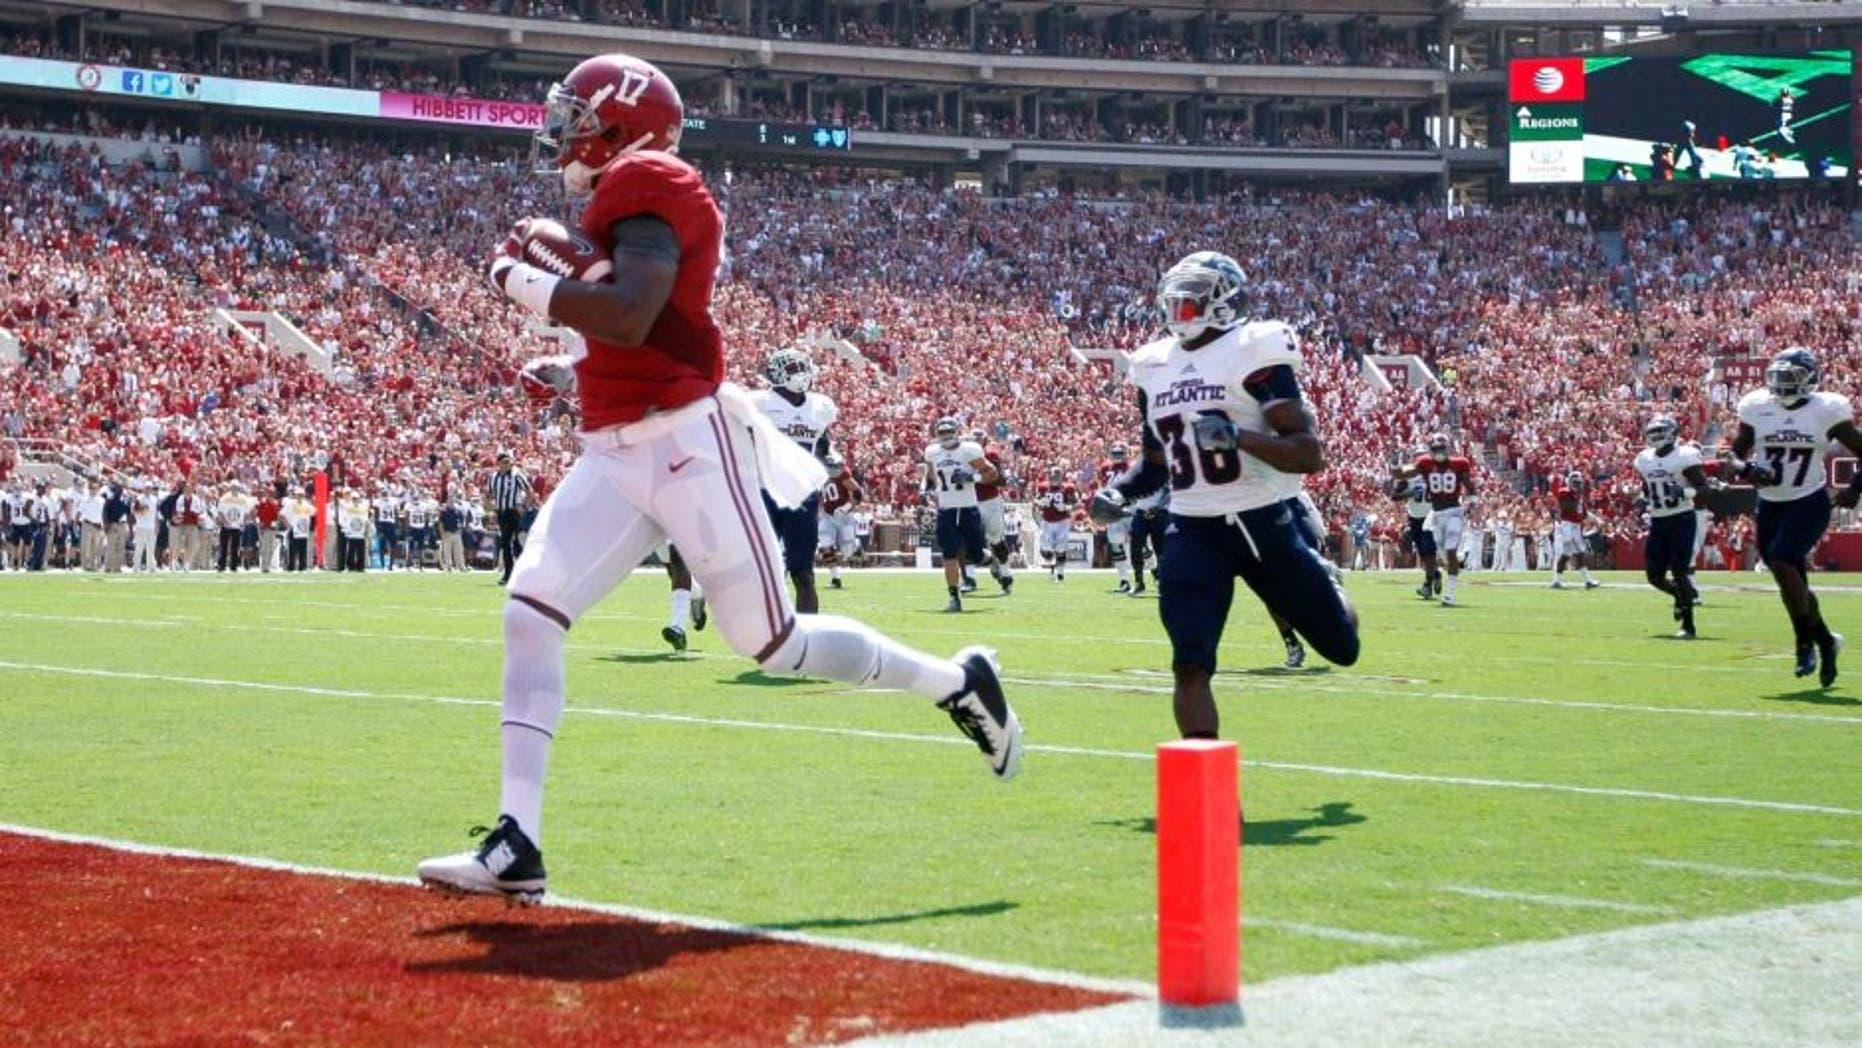 Sep 6, 2014; Tuscaloosa, AL, USA; Alabama Crimson Tide running back Kenyan Drake (17) scores against the Florida Atlantic Owls at Bryant-Denny Stadium. Mandatory Credit: Marvin Gentry-USA TODAY Sports